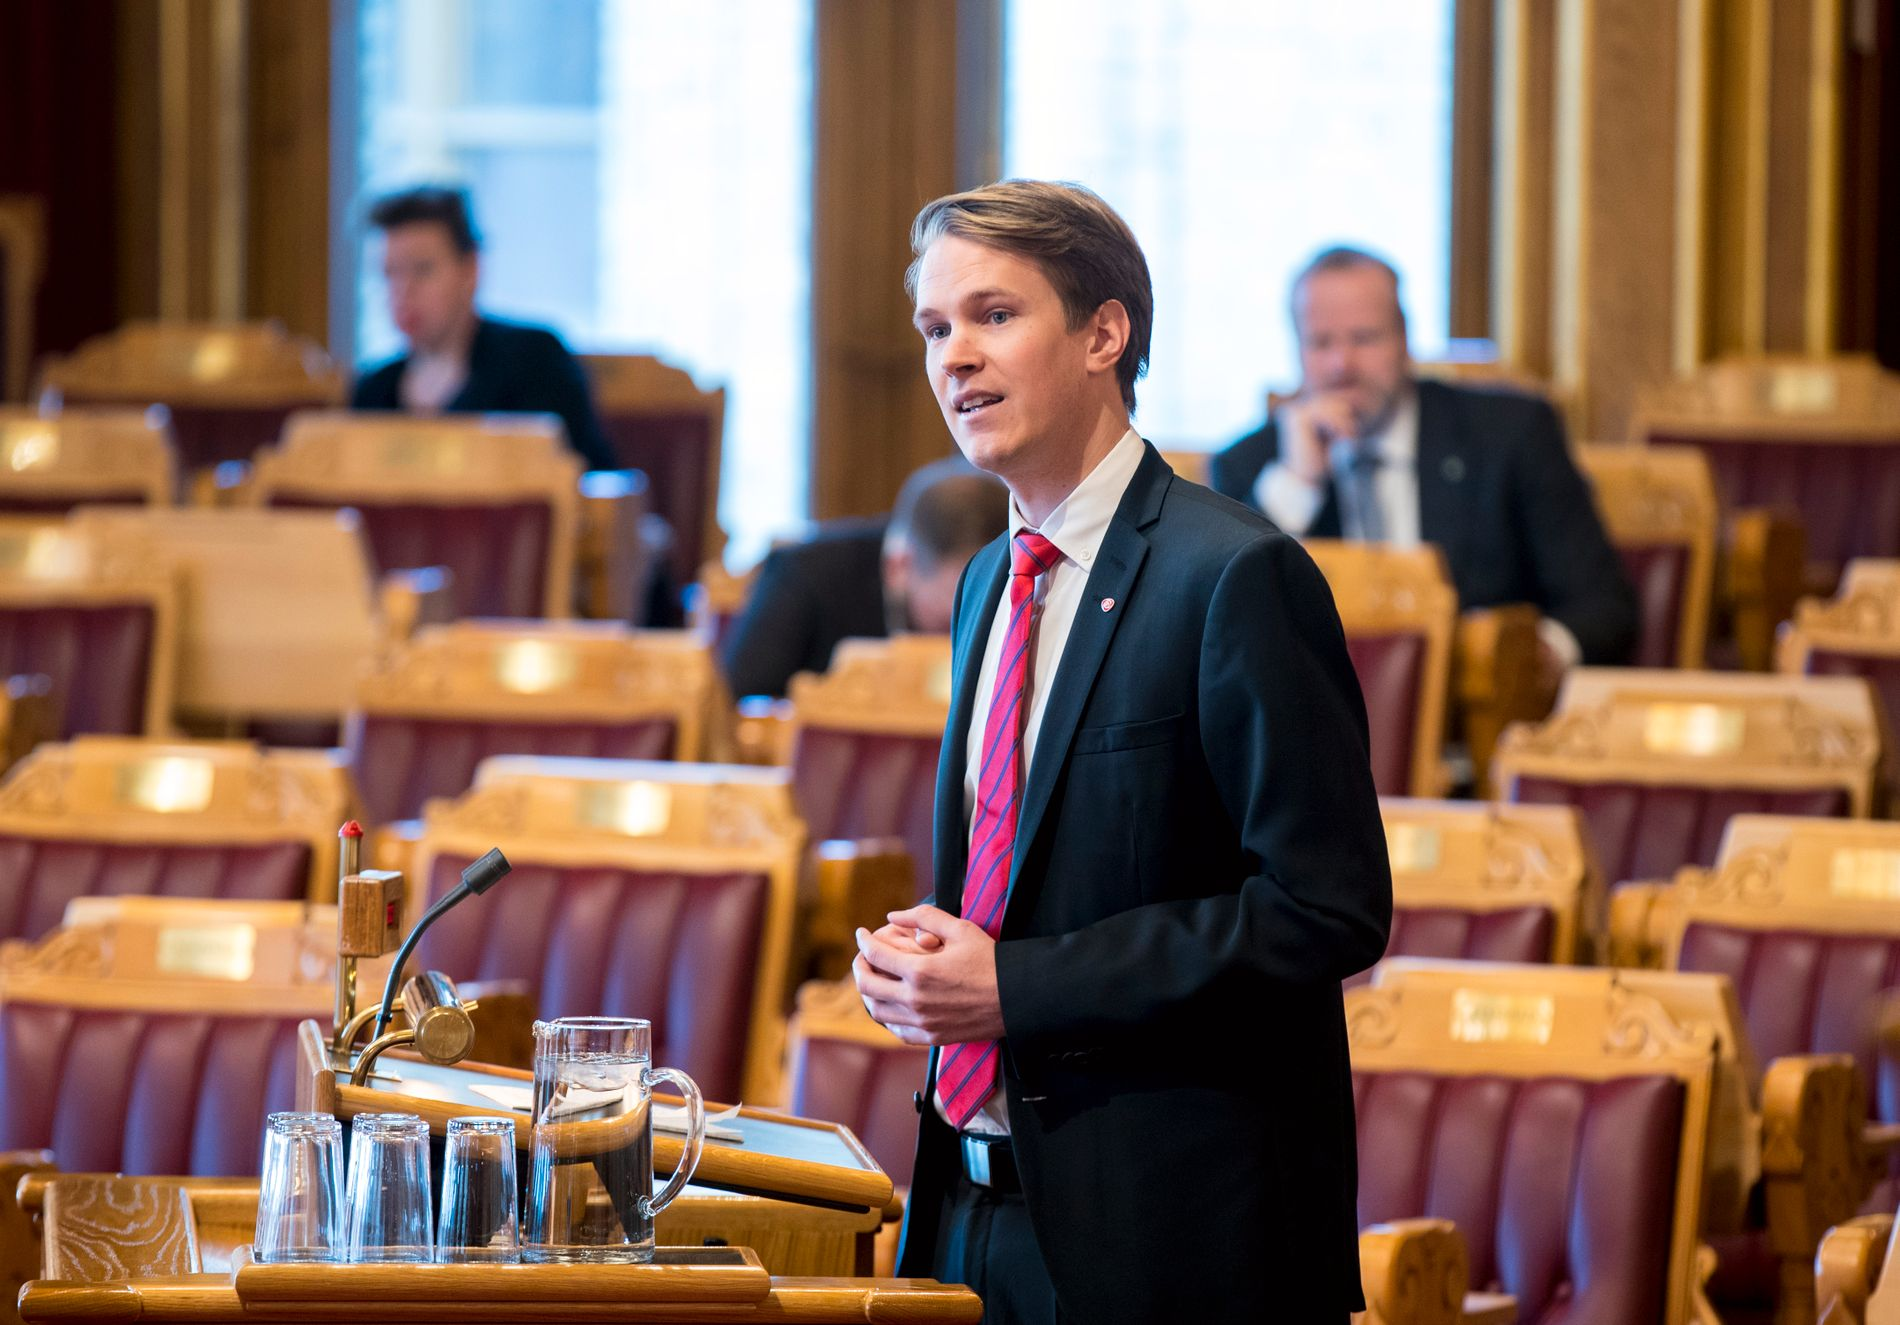 – SATS PÅ FOREBYGGING: Ap-politiker Torstein Tvedt Solberg mener regjeringen bør fokusere på hvordan mobbing kan forebygges.